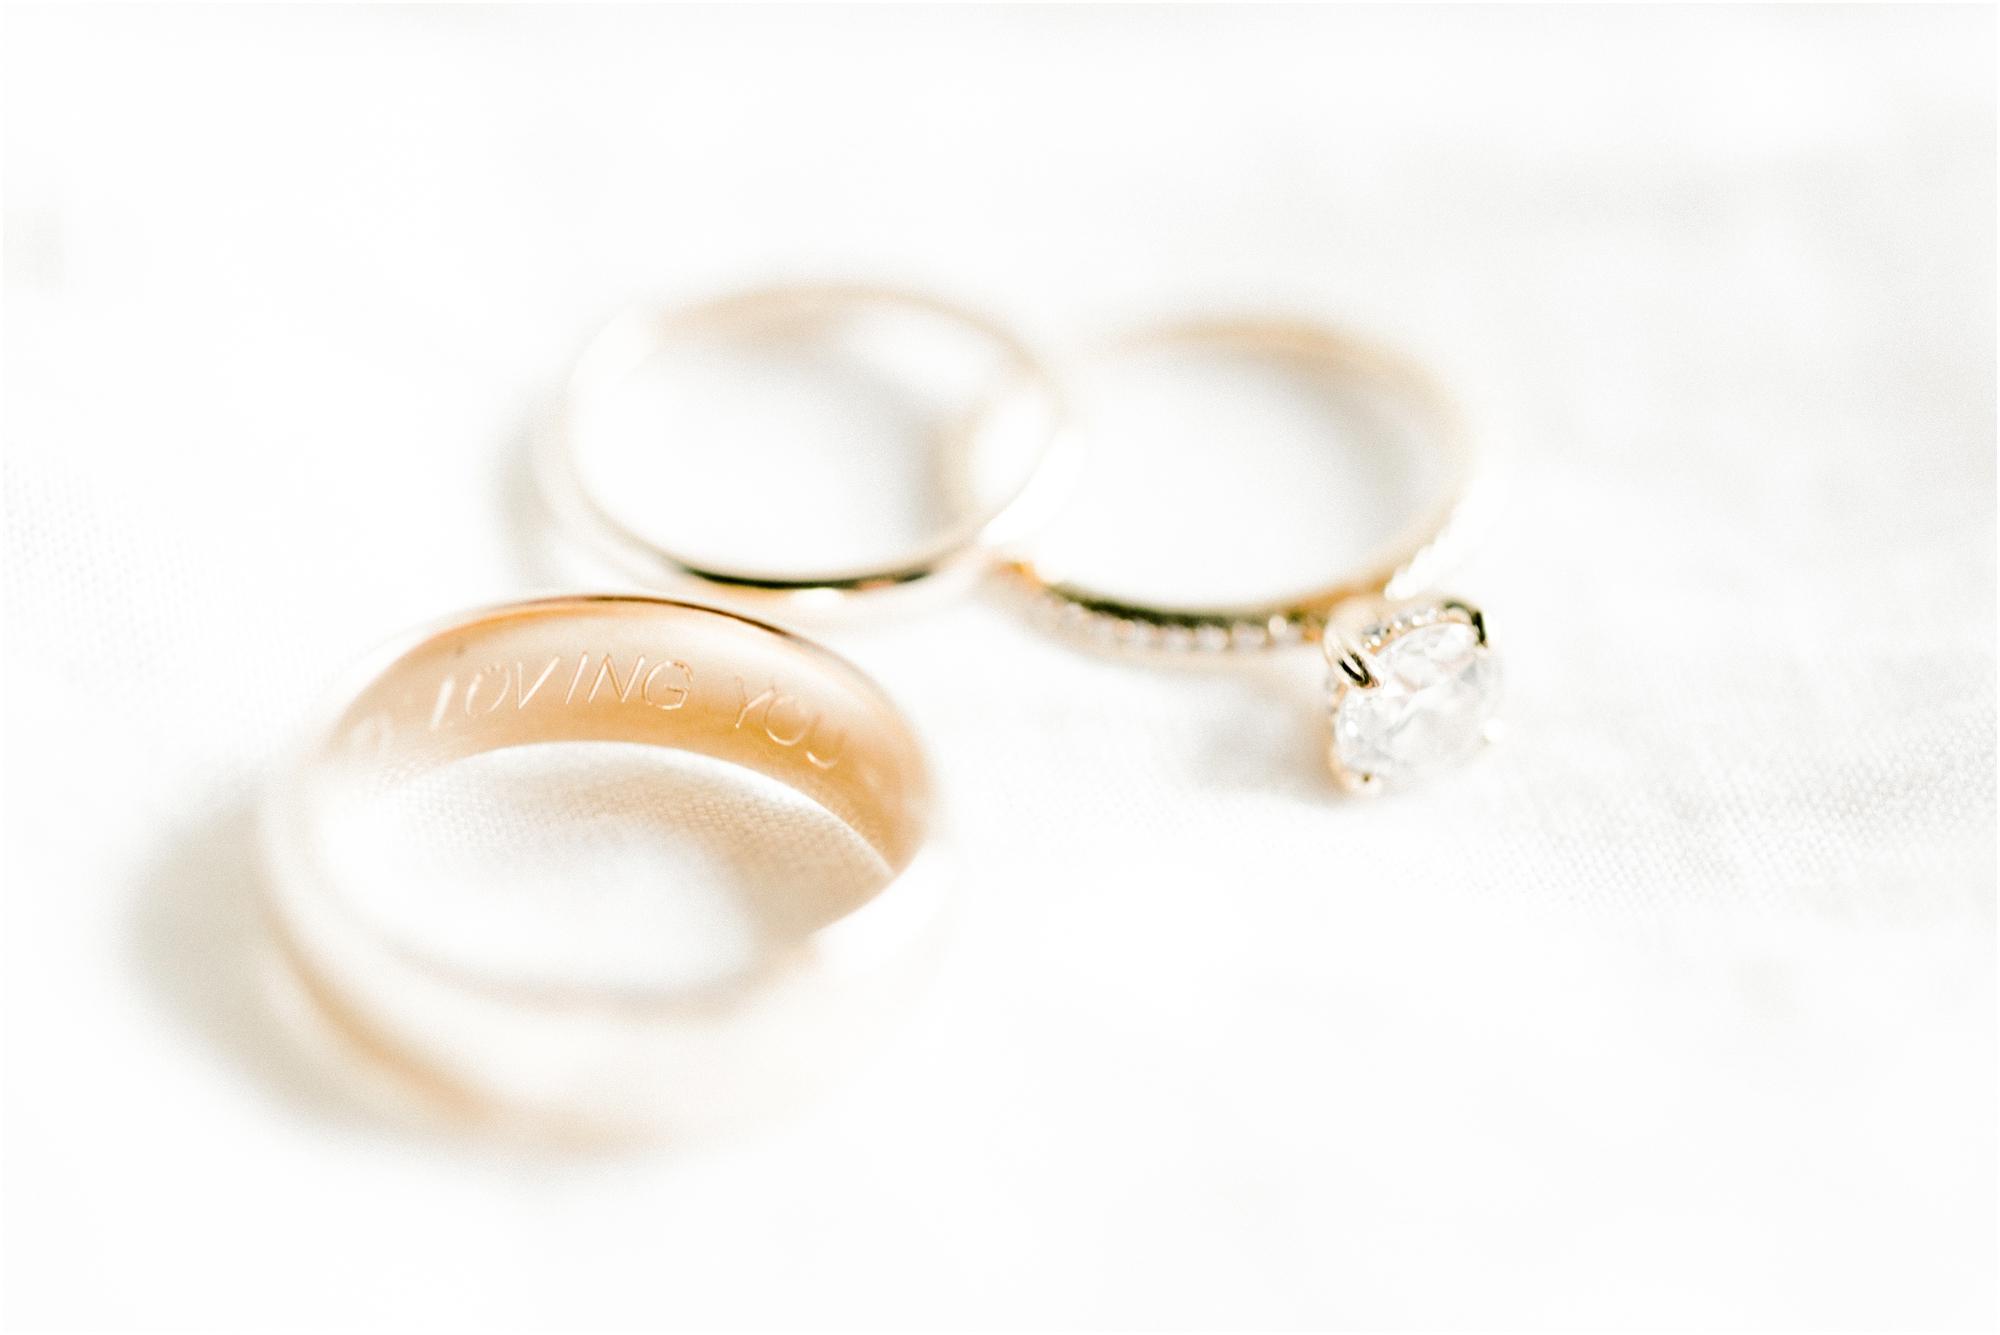 Wedding Ring Inscription by Jordan Brittley Photography